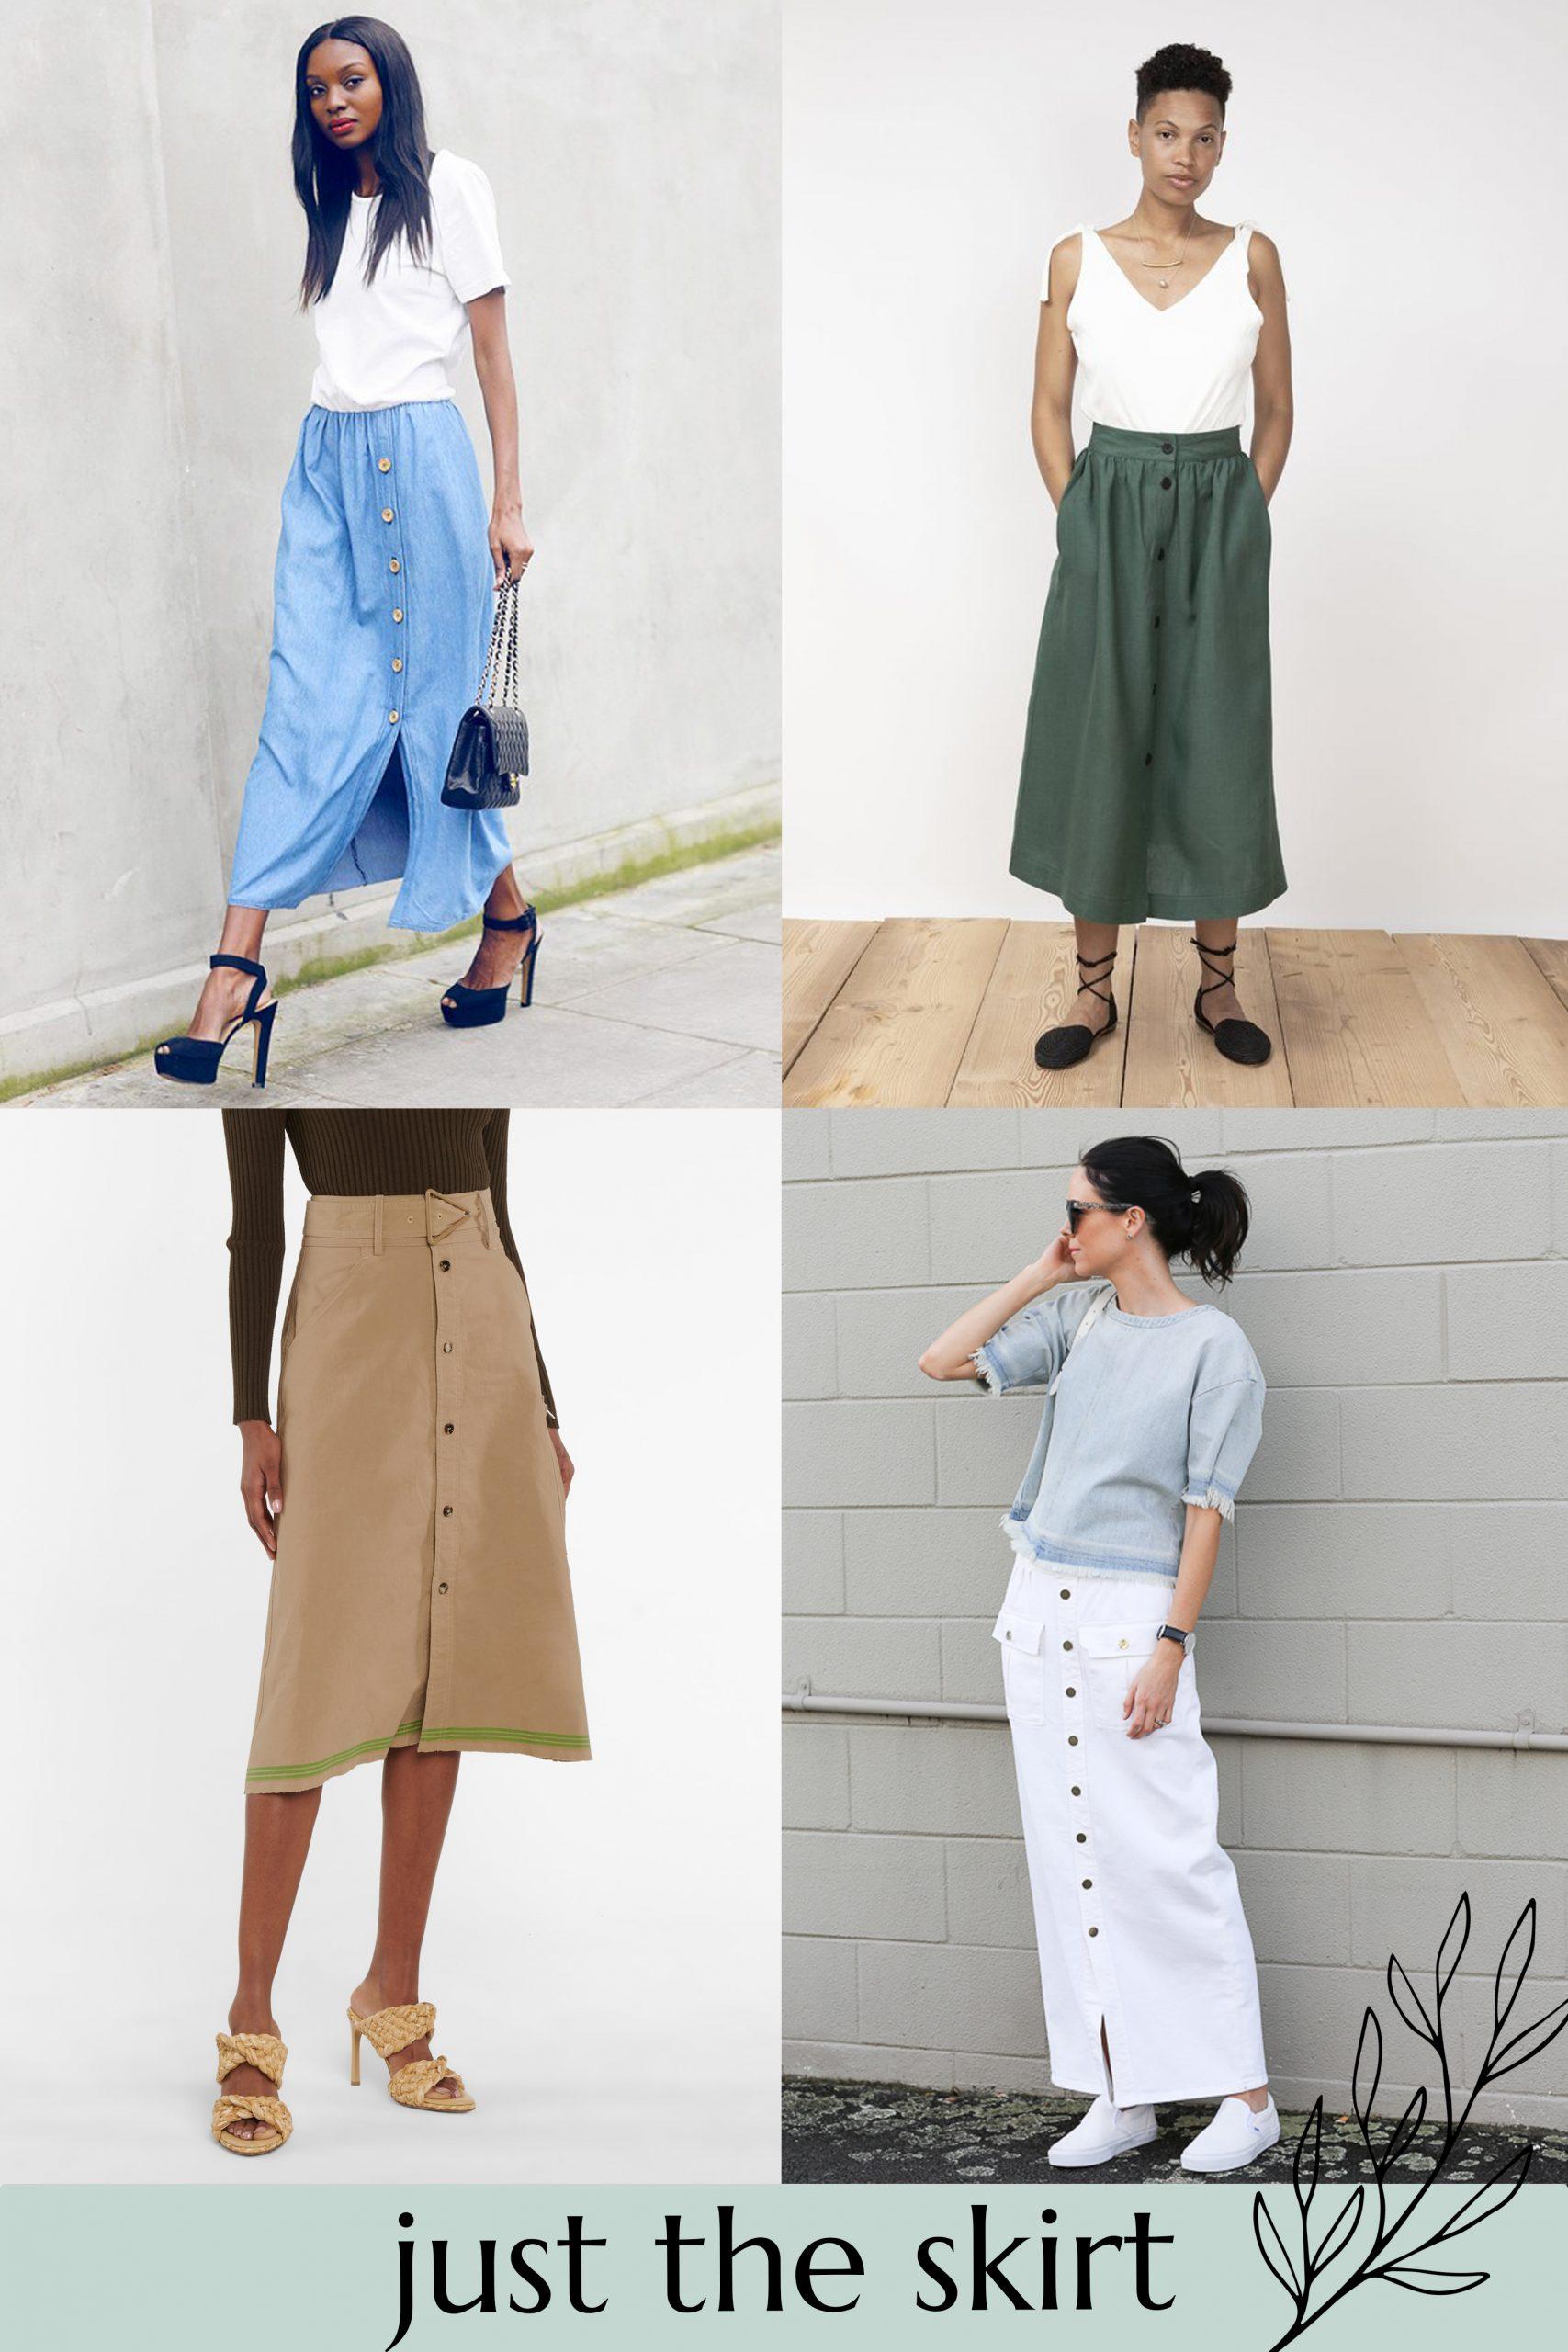 Matilda skirt inspiration